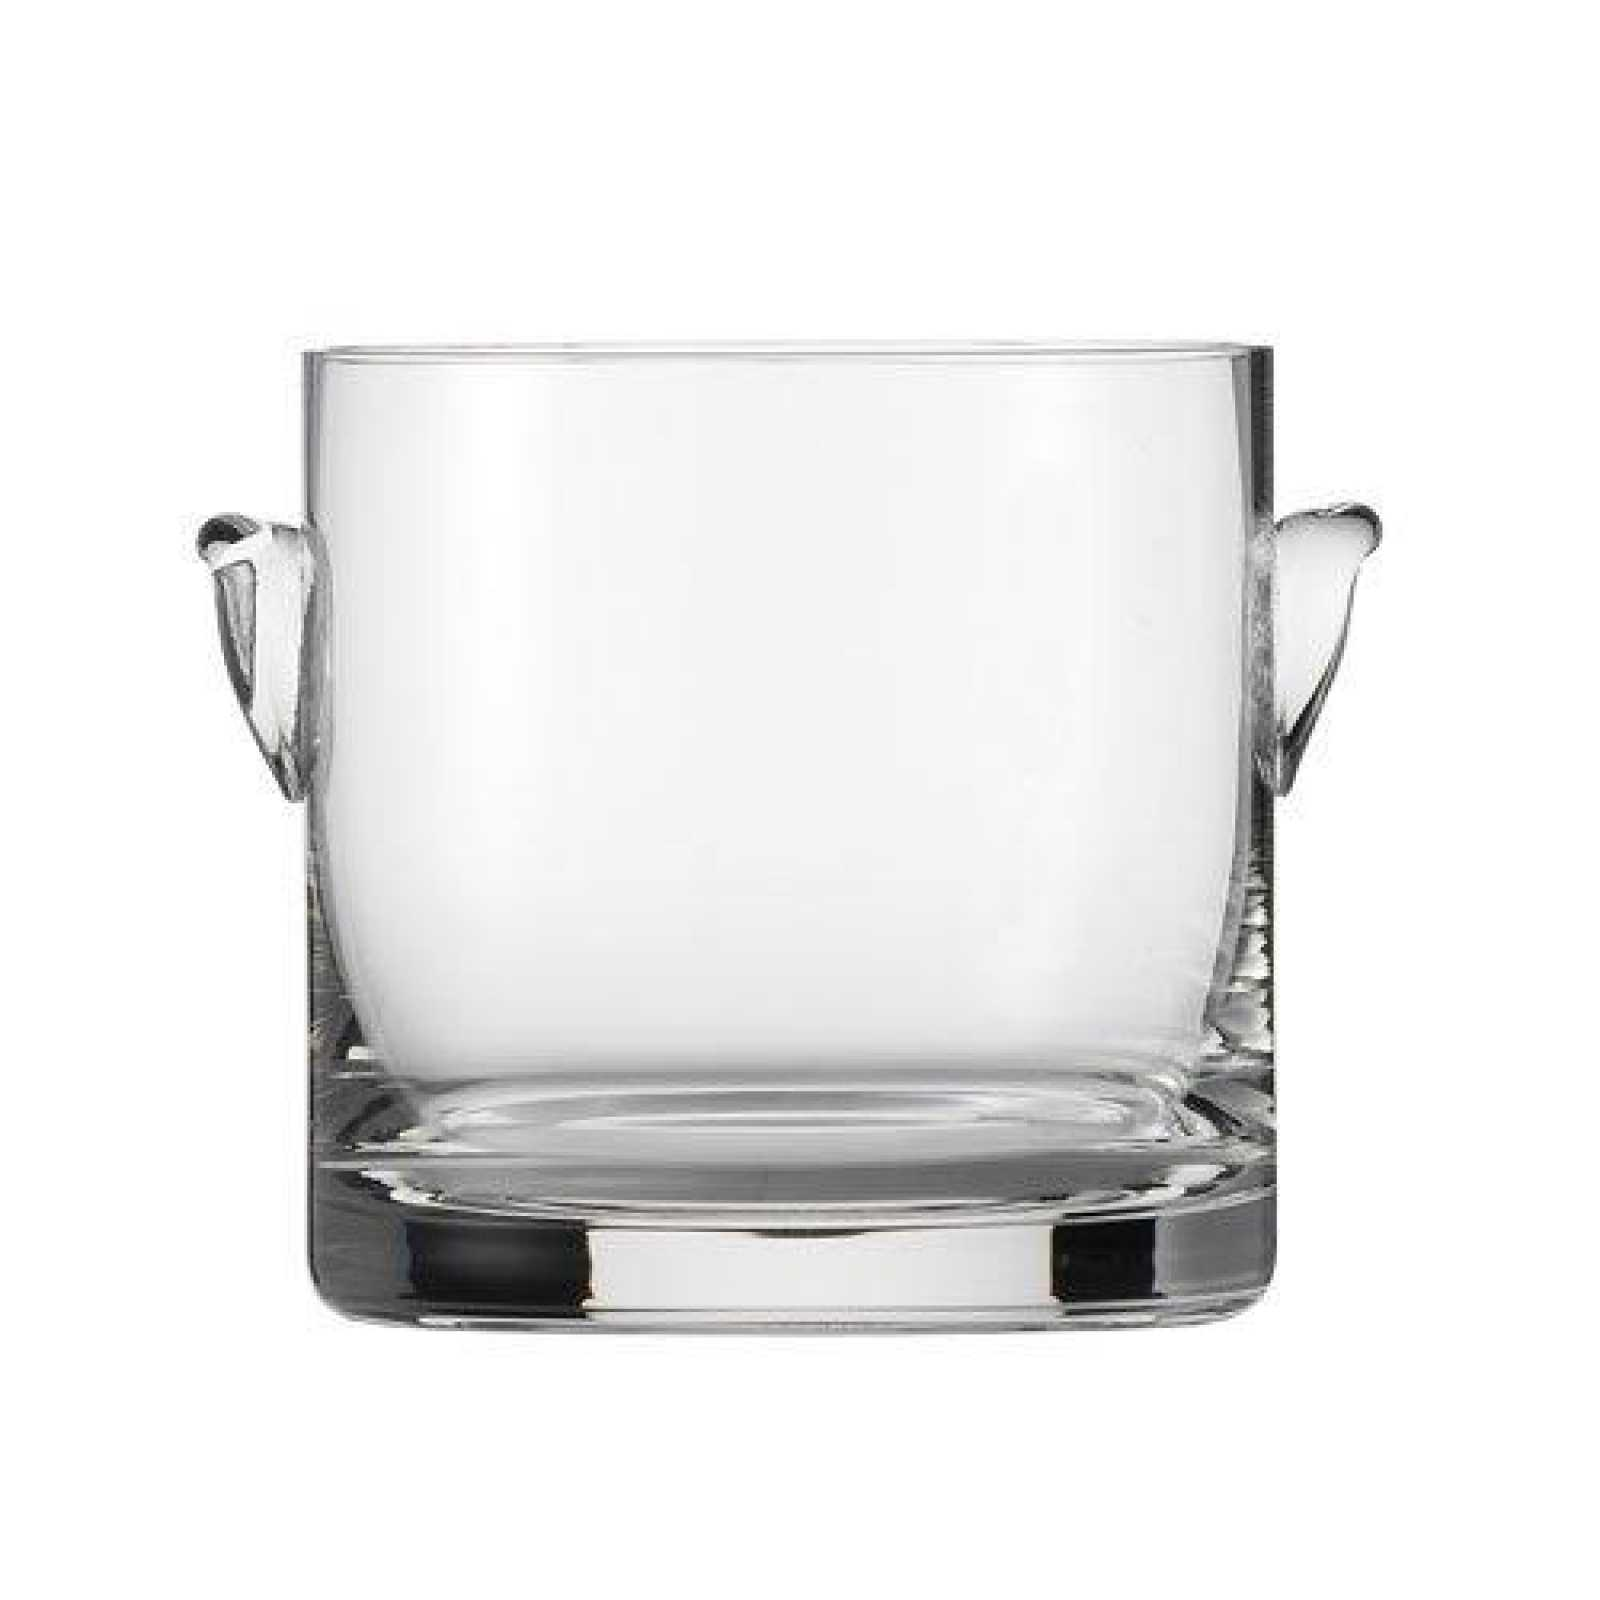 Ведерко для льда Schott Zwiesel Bar Special, прозрачный Schott Zwiesel 112713 фото 0